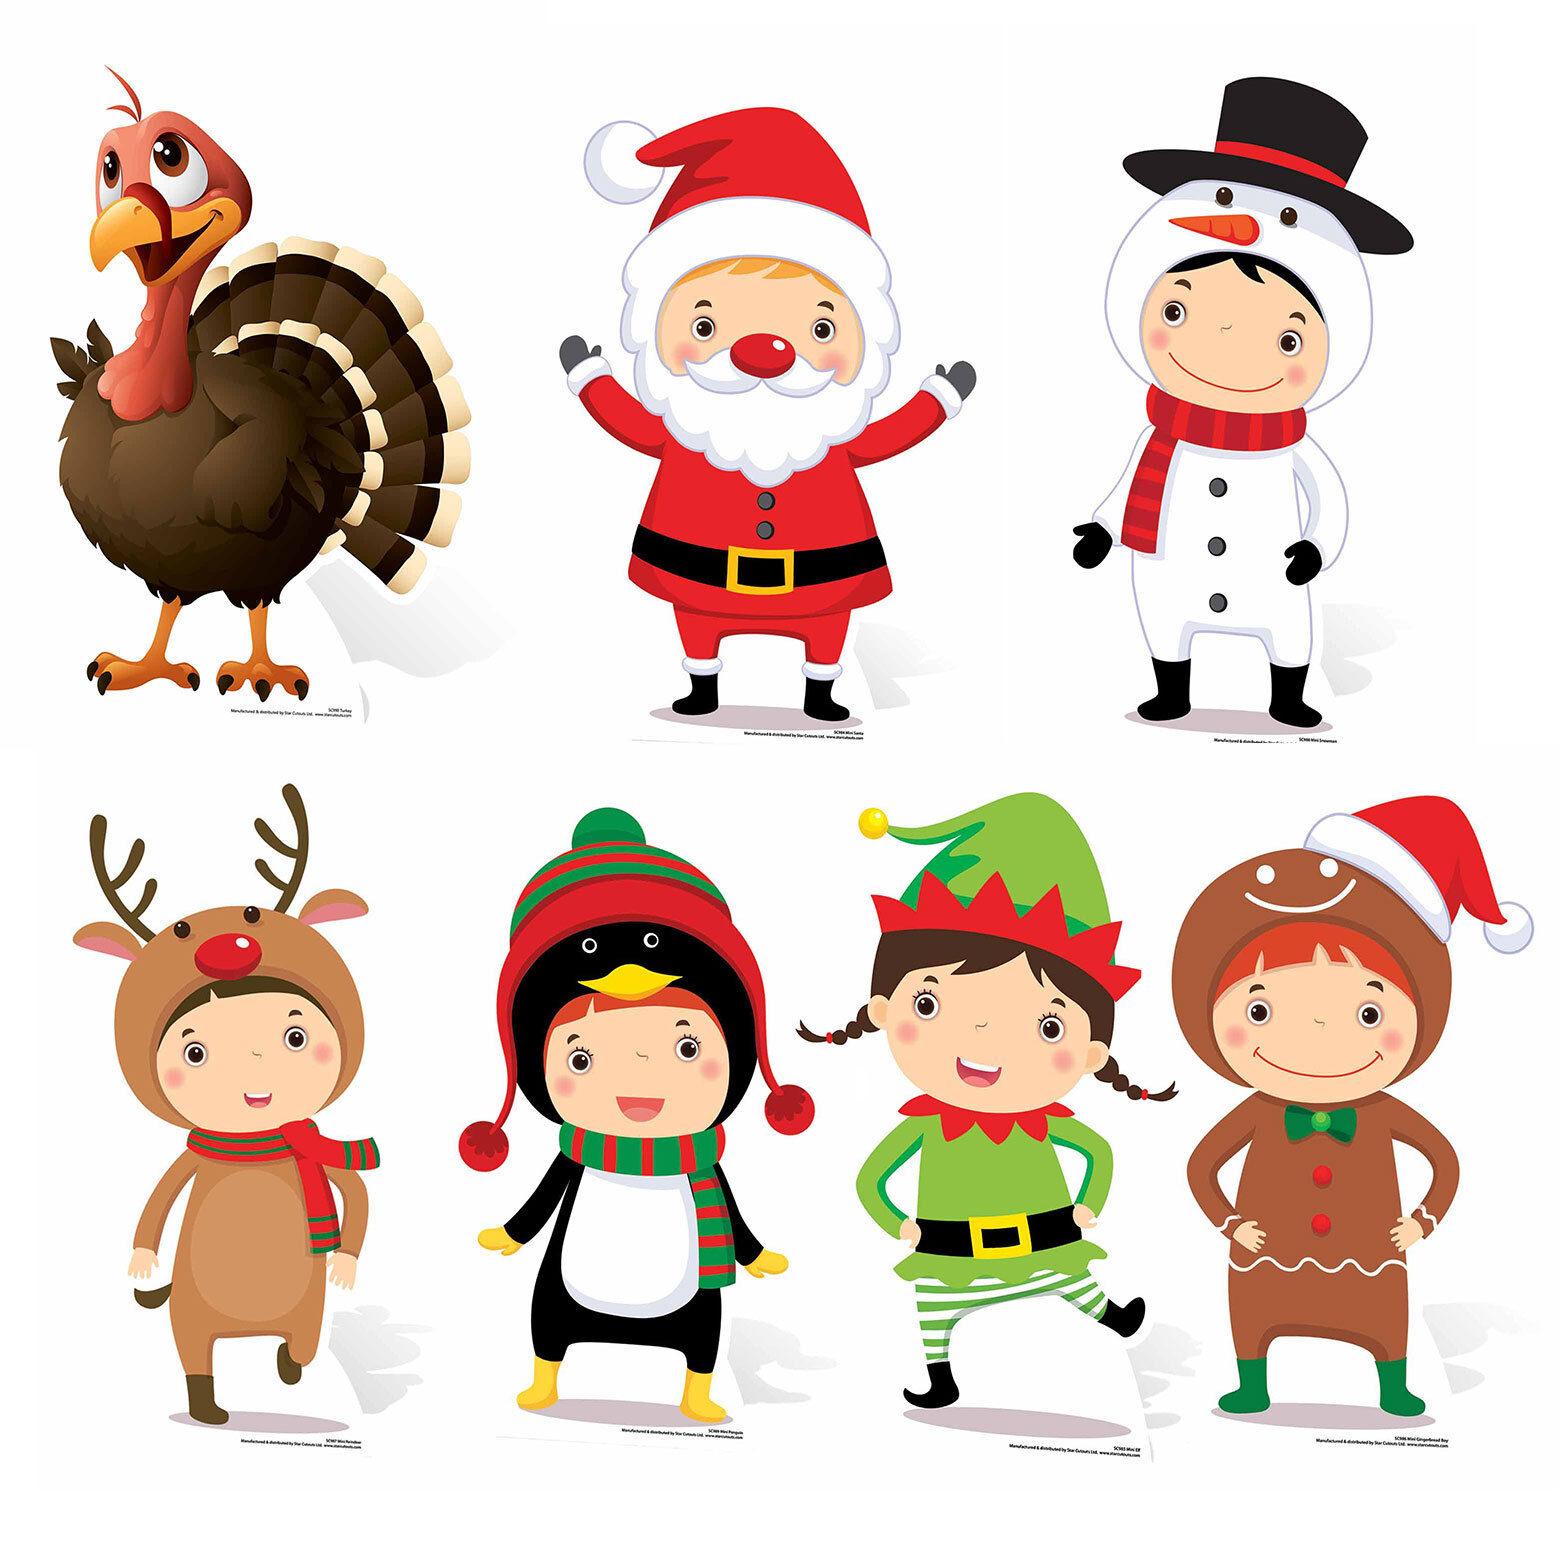 Christmas Themed Mini Cardboard Cutout Collection Set Festive -  7 Cutouts